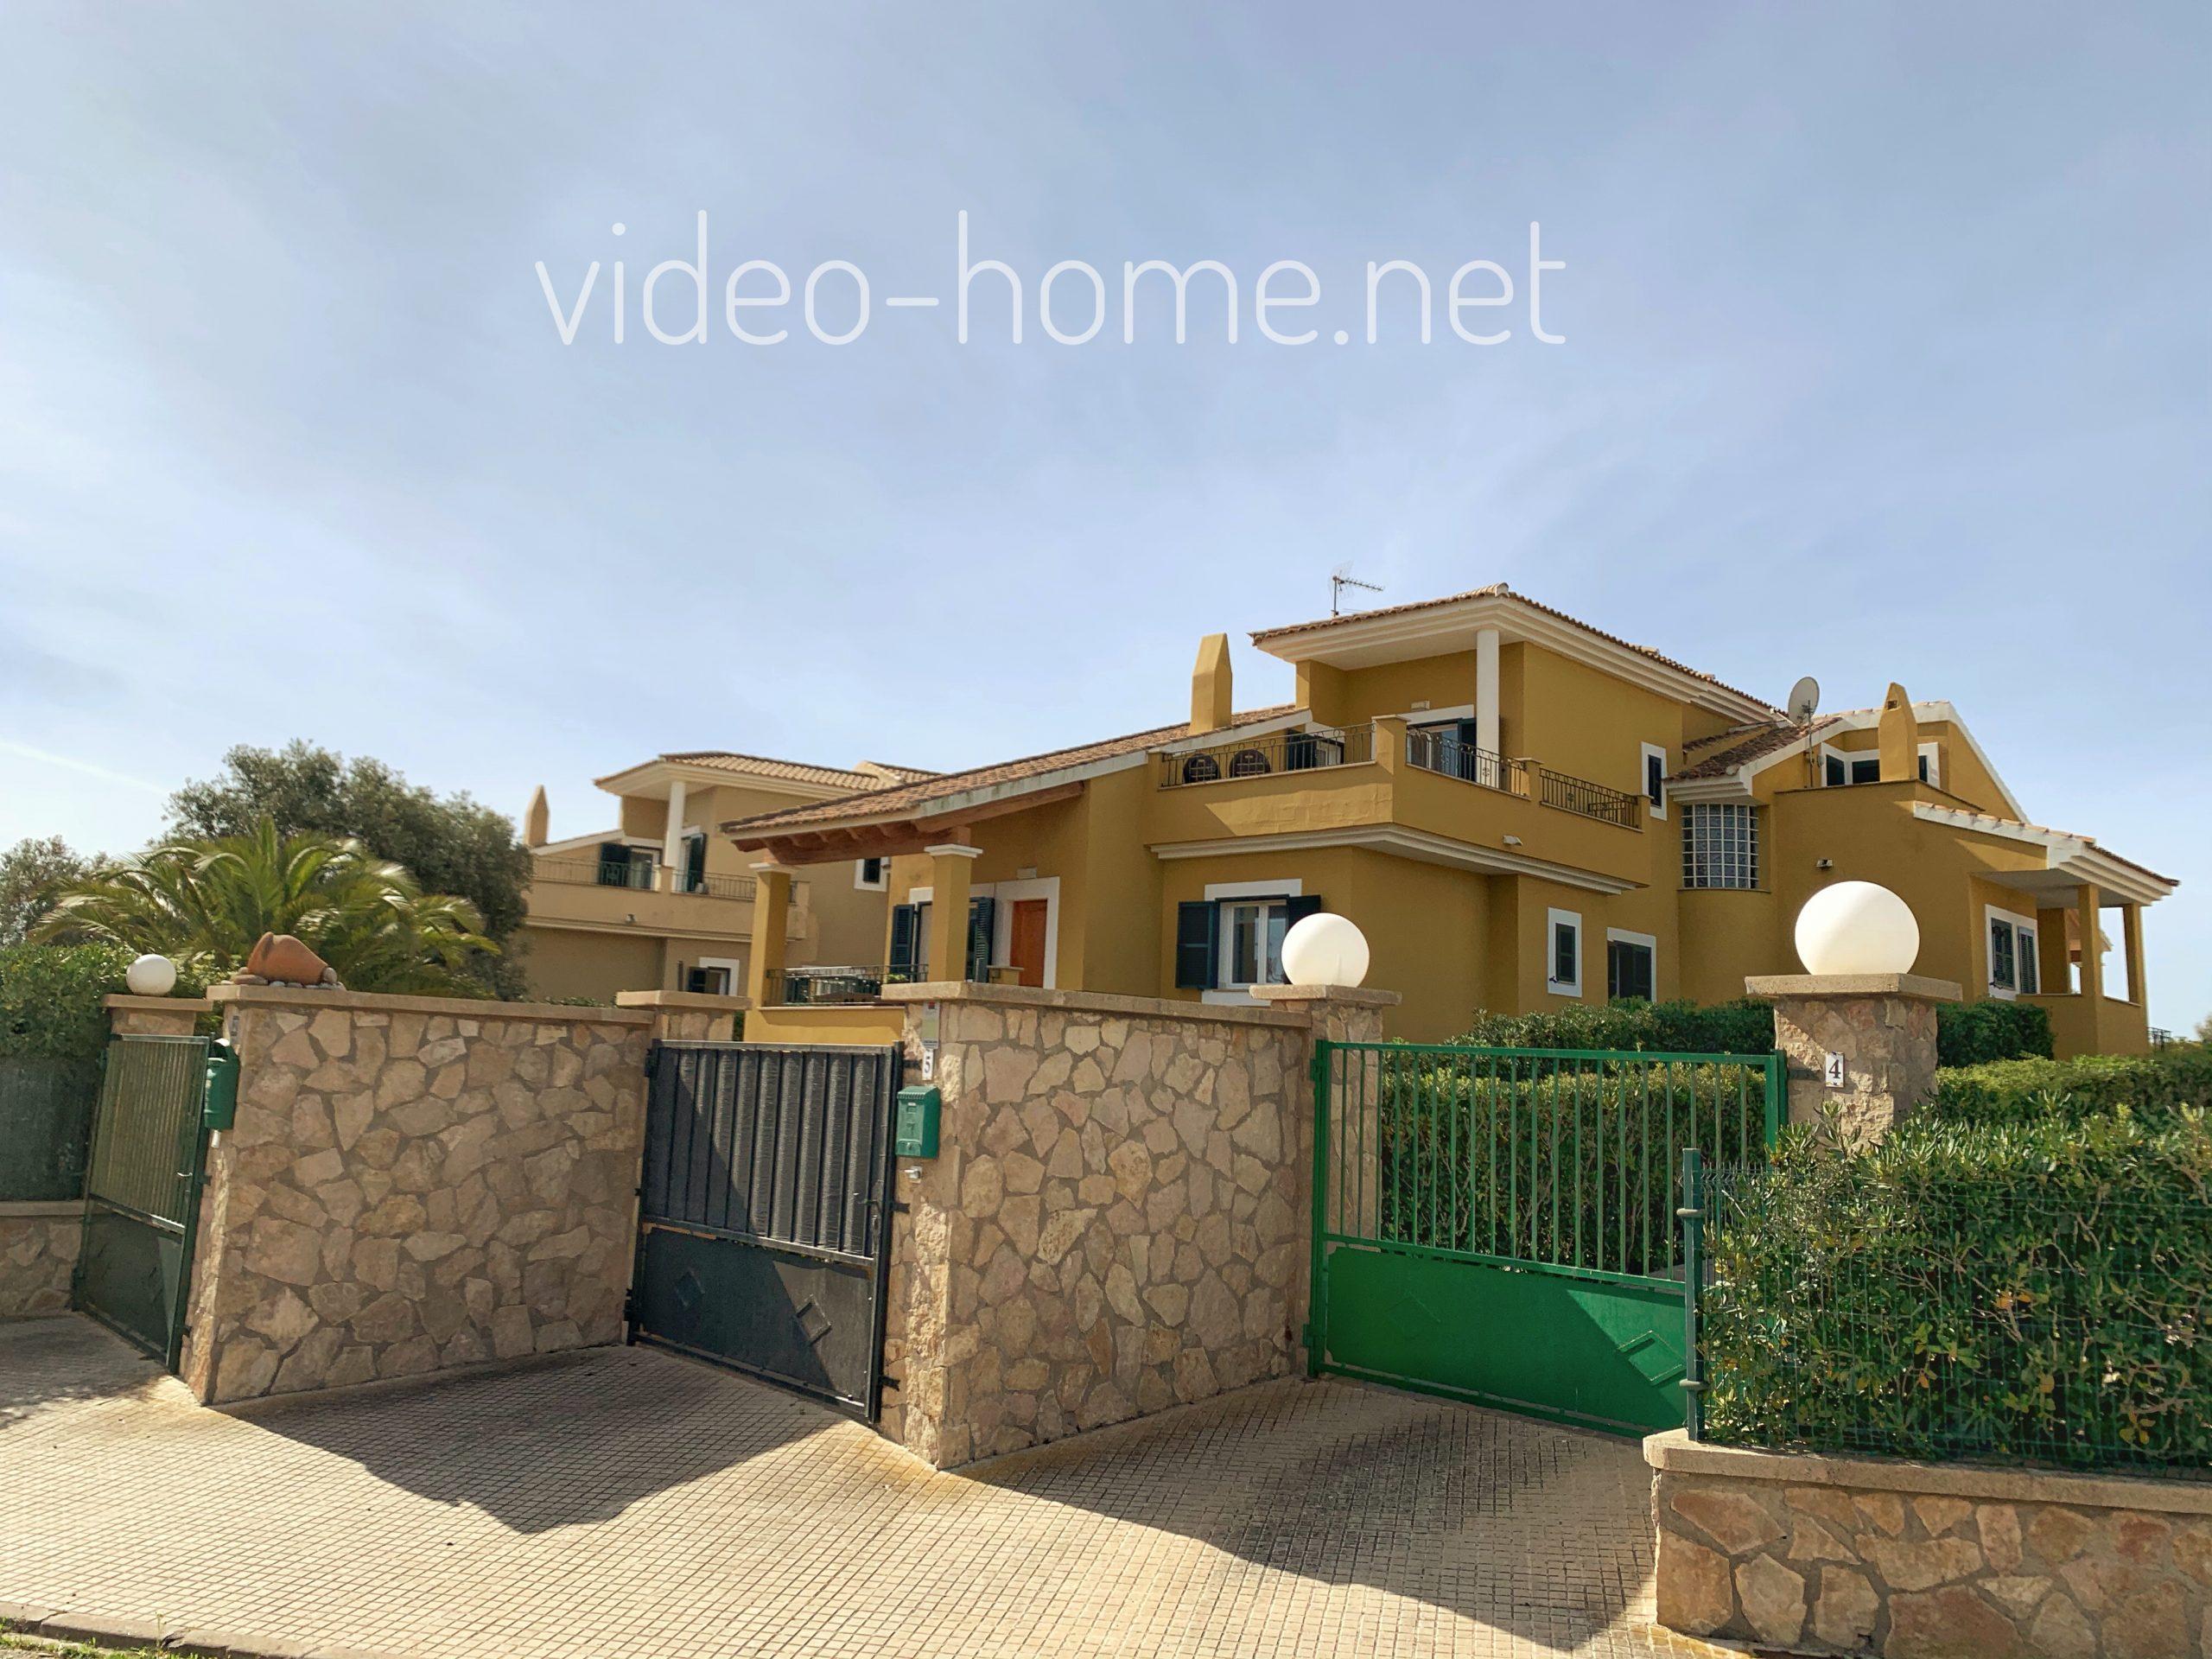 Preciosa casa con jardín a 2 minutos del mar en Calas de Mallorca.